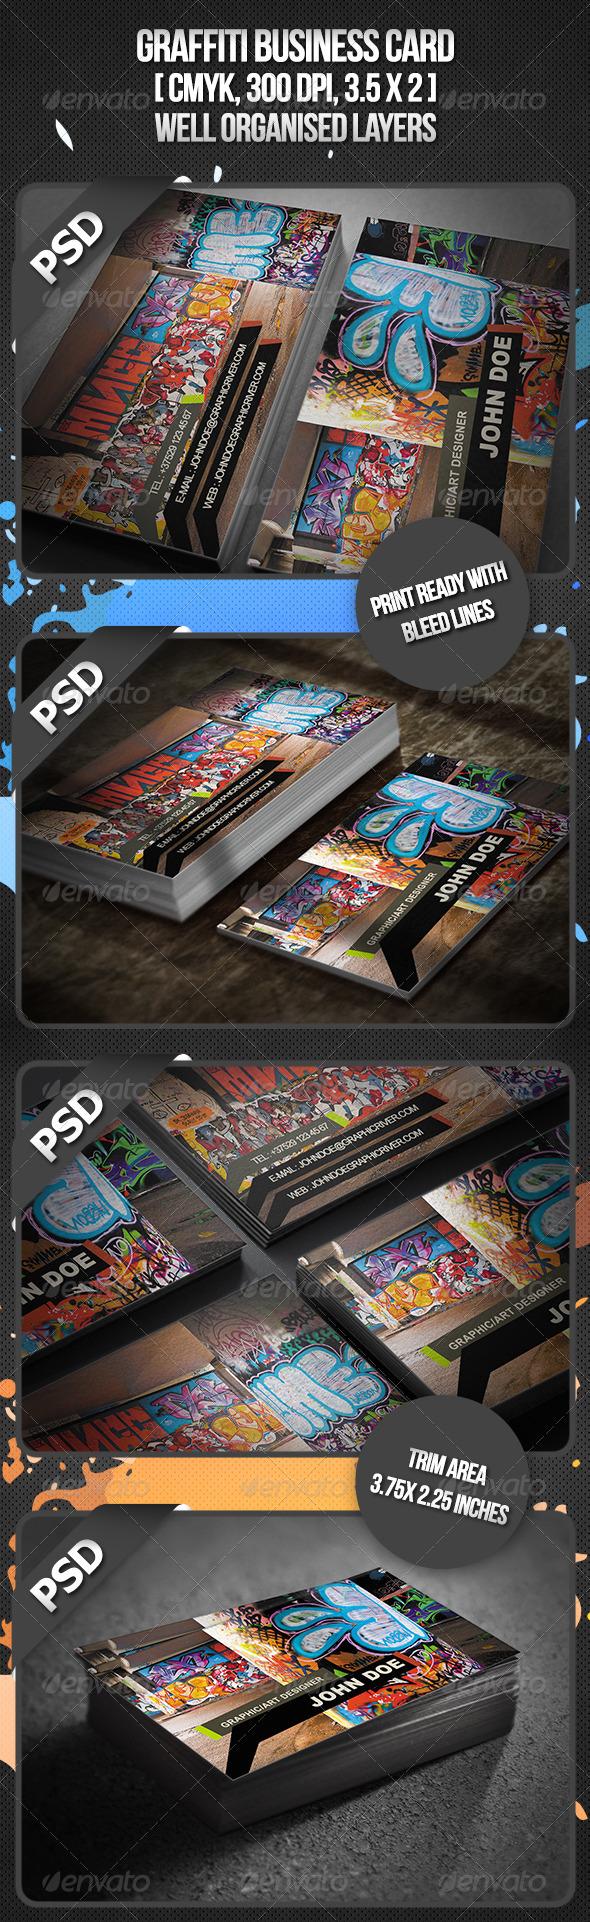 Graffiti Business Card - Business Cards Print Templates